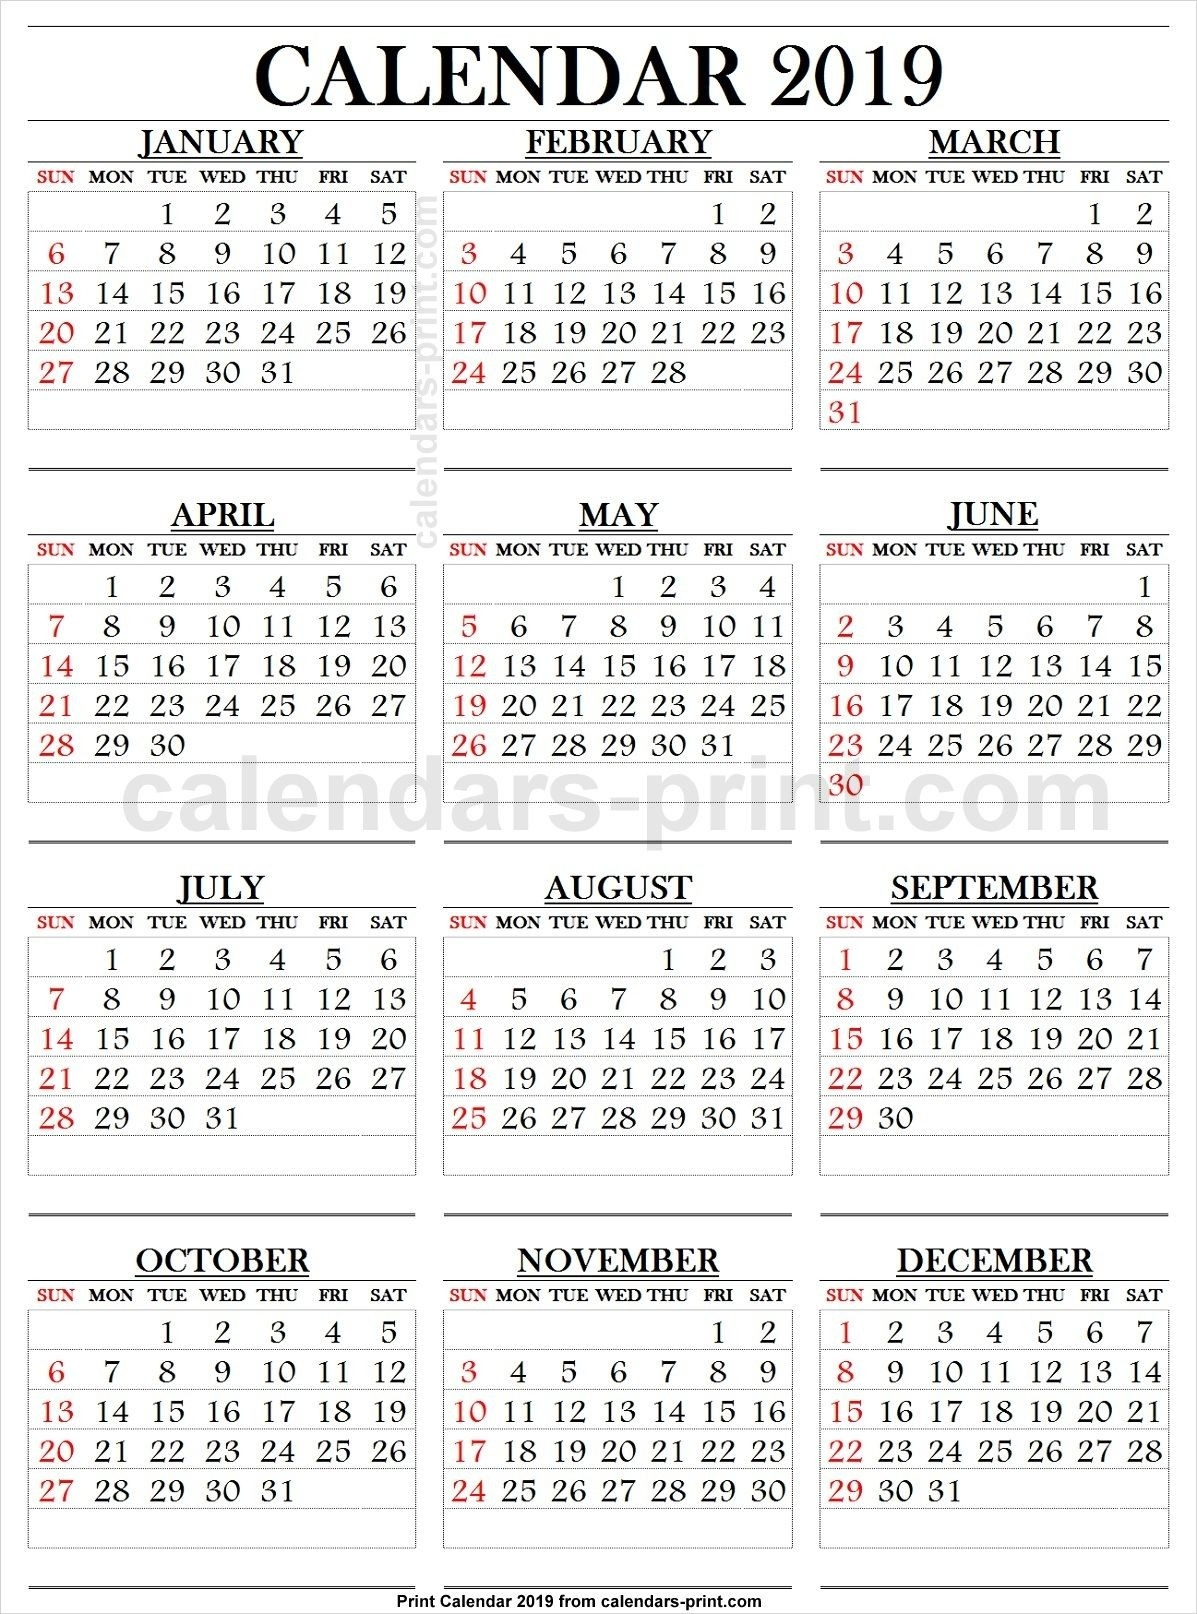 2019 Calendar Large Numbers   Printable Calendar Large-Printable Calendars Large Numbers